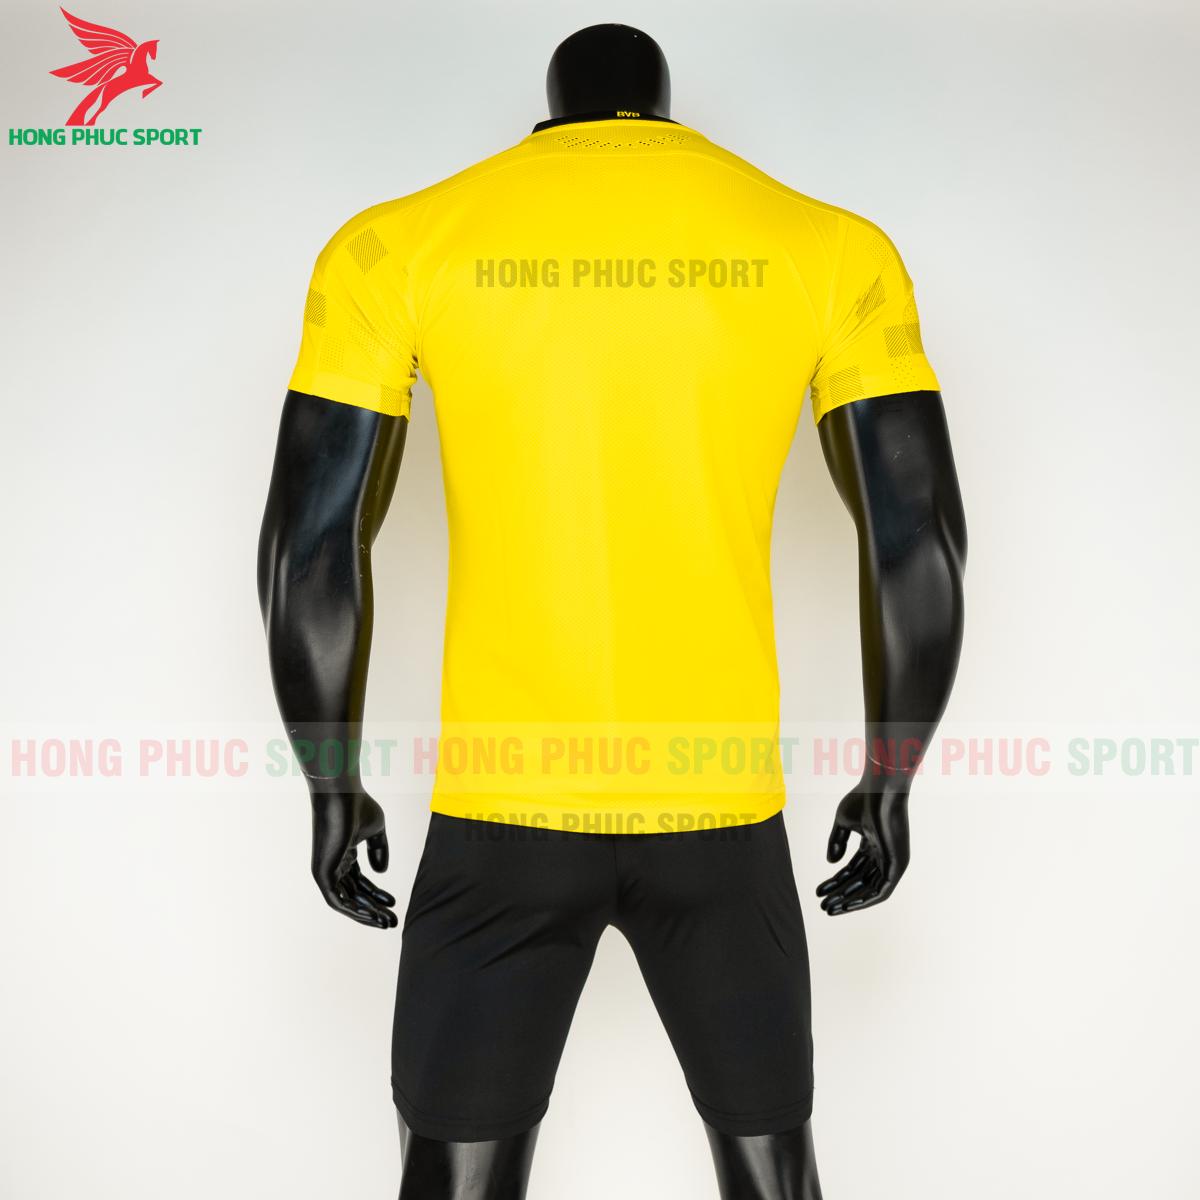 https://cdn.hongphucsport.com/unsafe/s4.shopbay.vn/files/285/ao-dortmund-thi-dau-cup-20-21-san-nha-hang-thailand-8-5fb1f0f4e7504.png